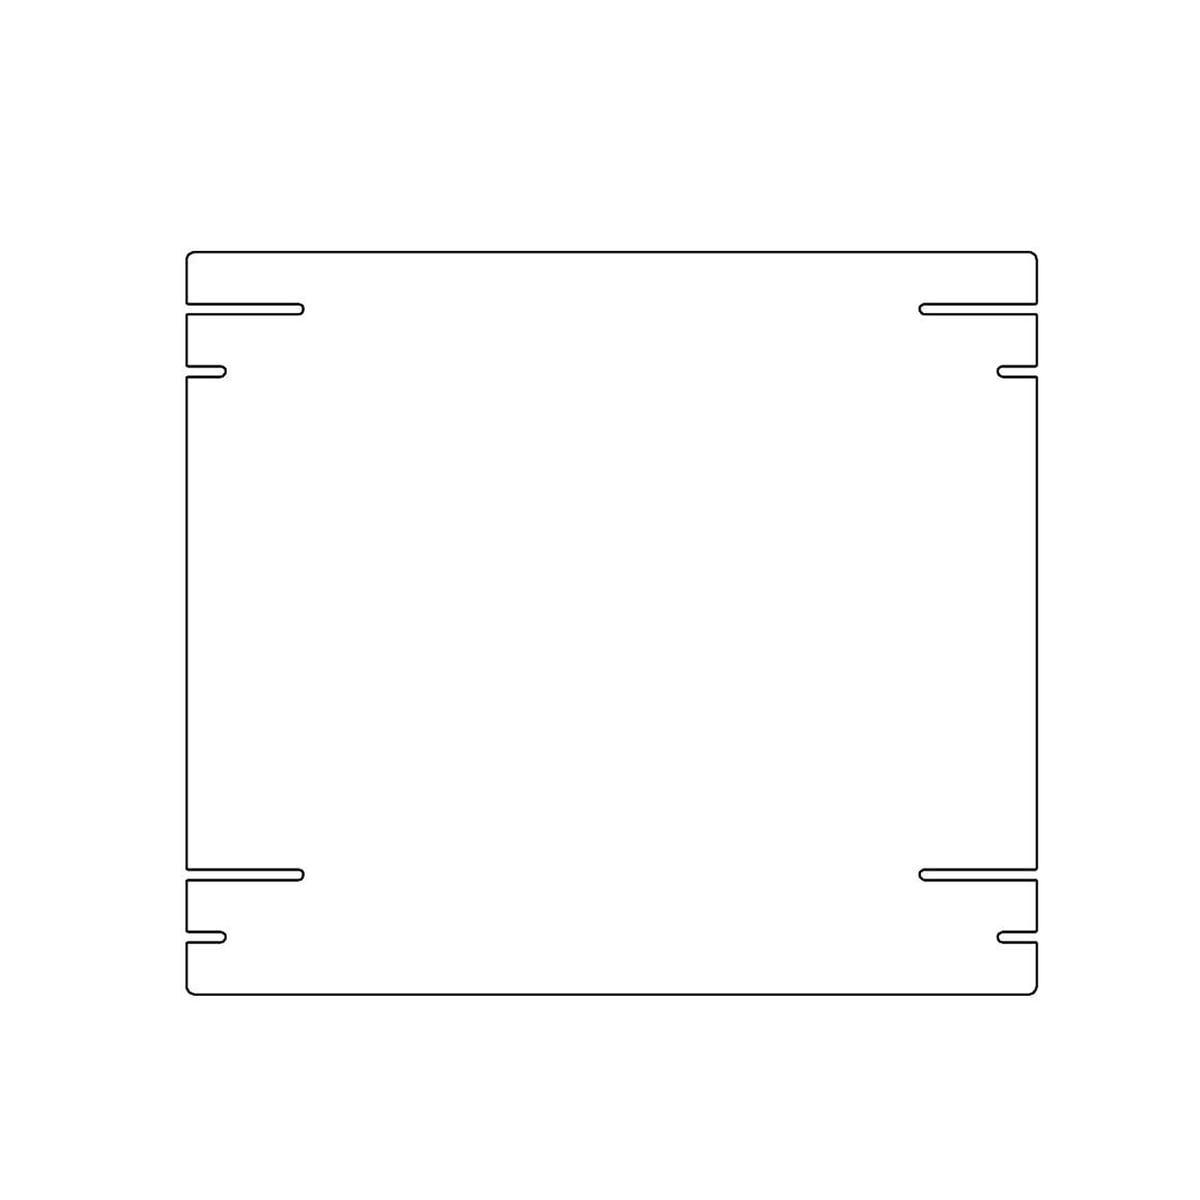 Regalsystem Plattenbau | Shop